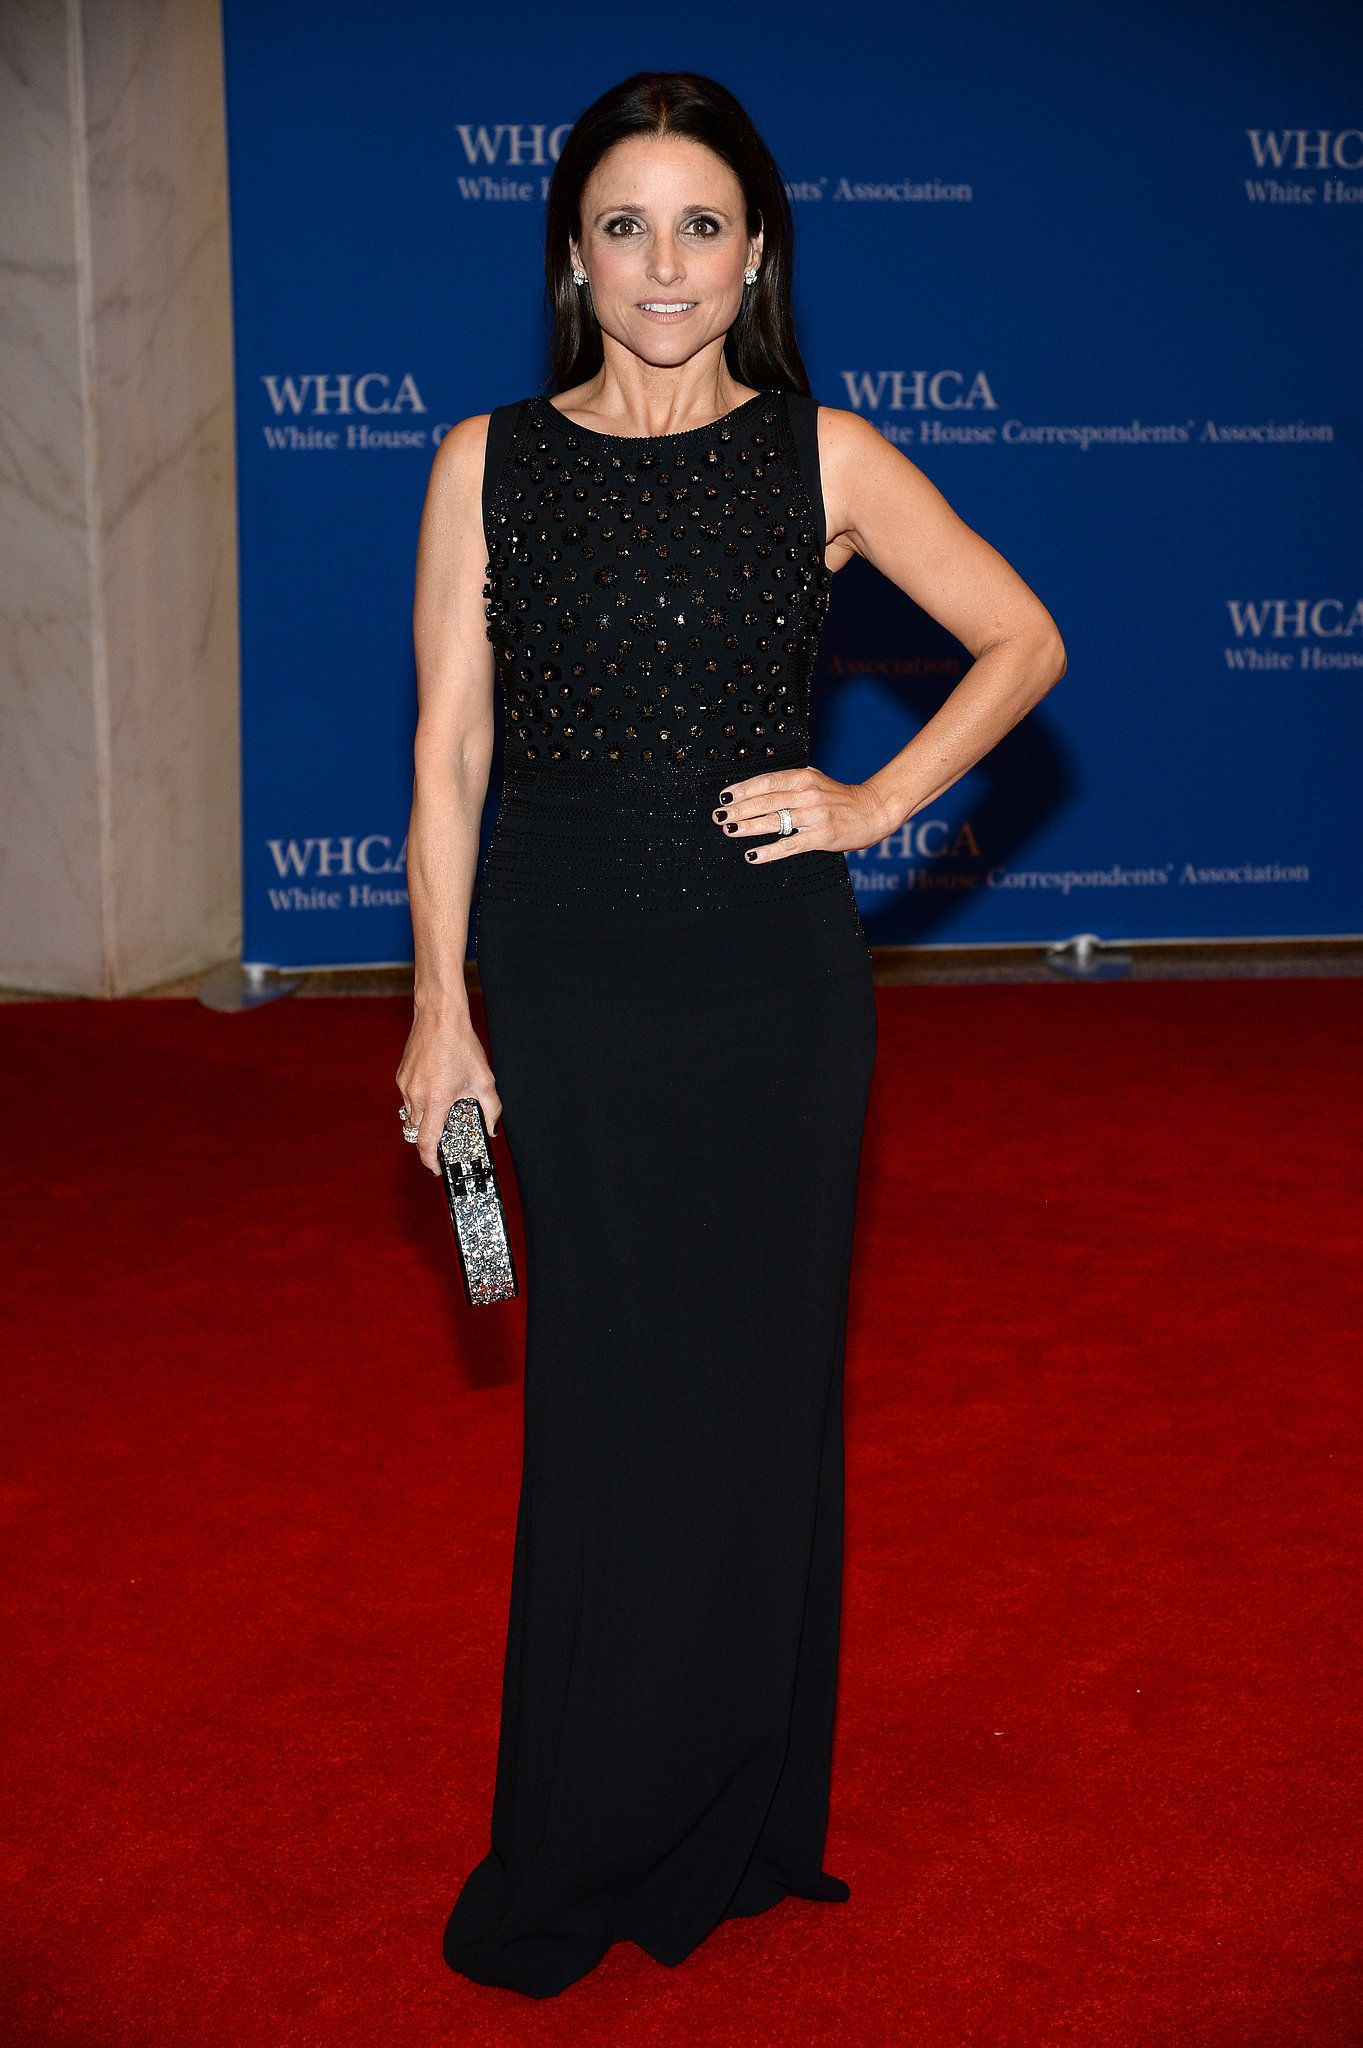 Julia louisdreyfus had her turn on the red carpet celebrity